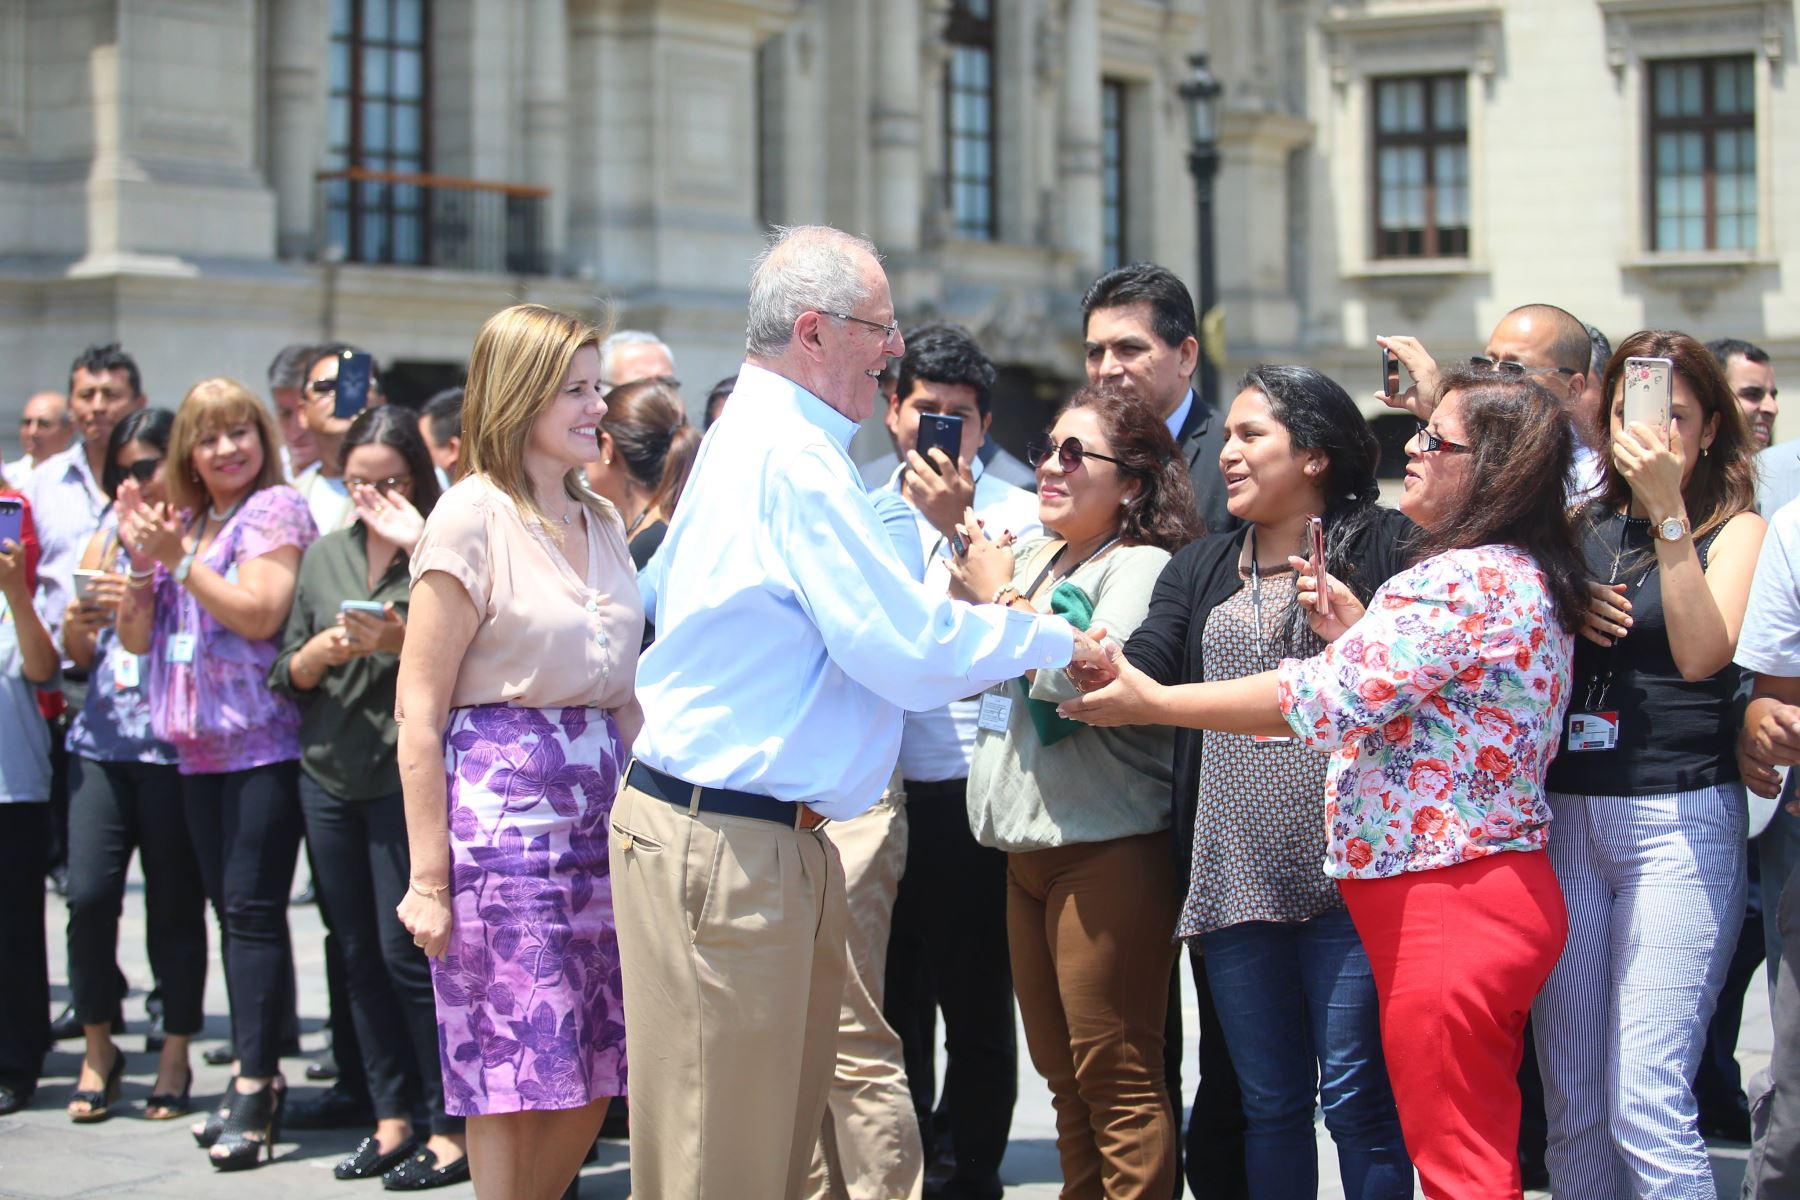 Presidente Pedro Pablo Kuczynski, se despide de trabajadores de palacio de gobierno.Foto:ANDINA/Prensa Presidencia